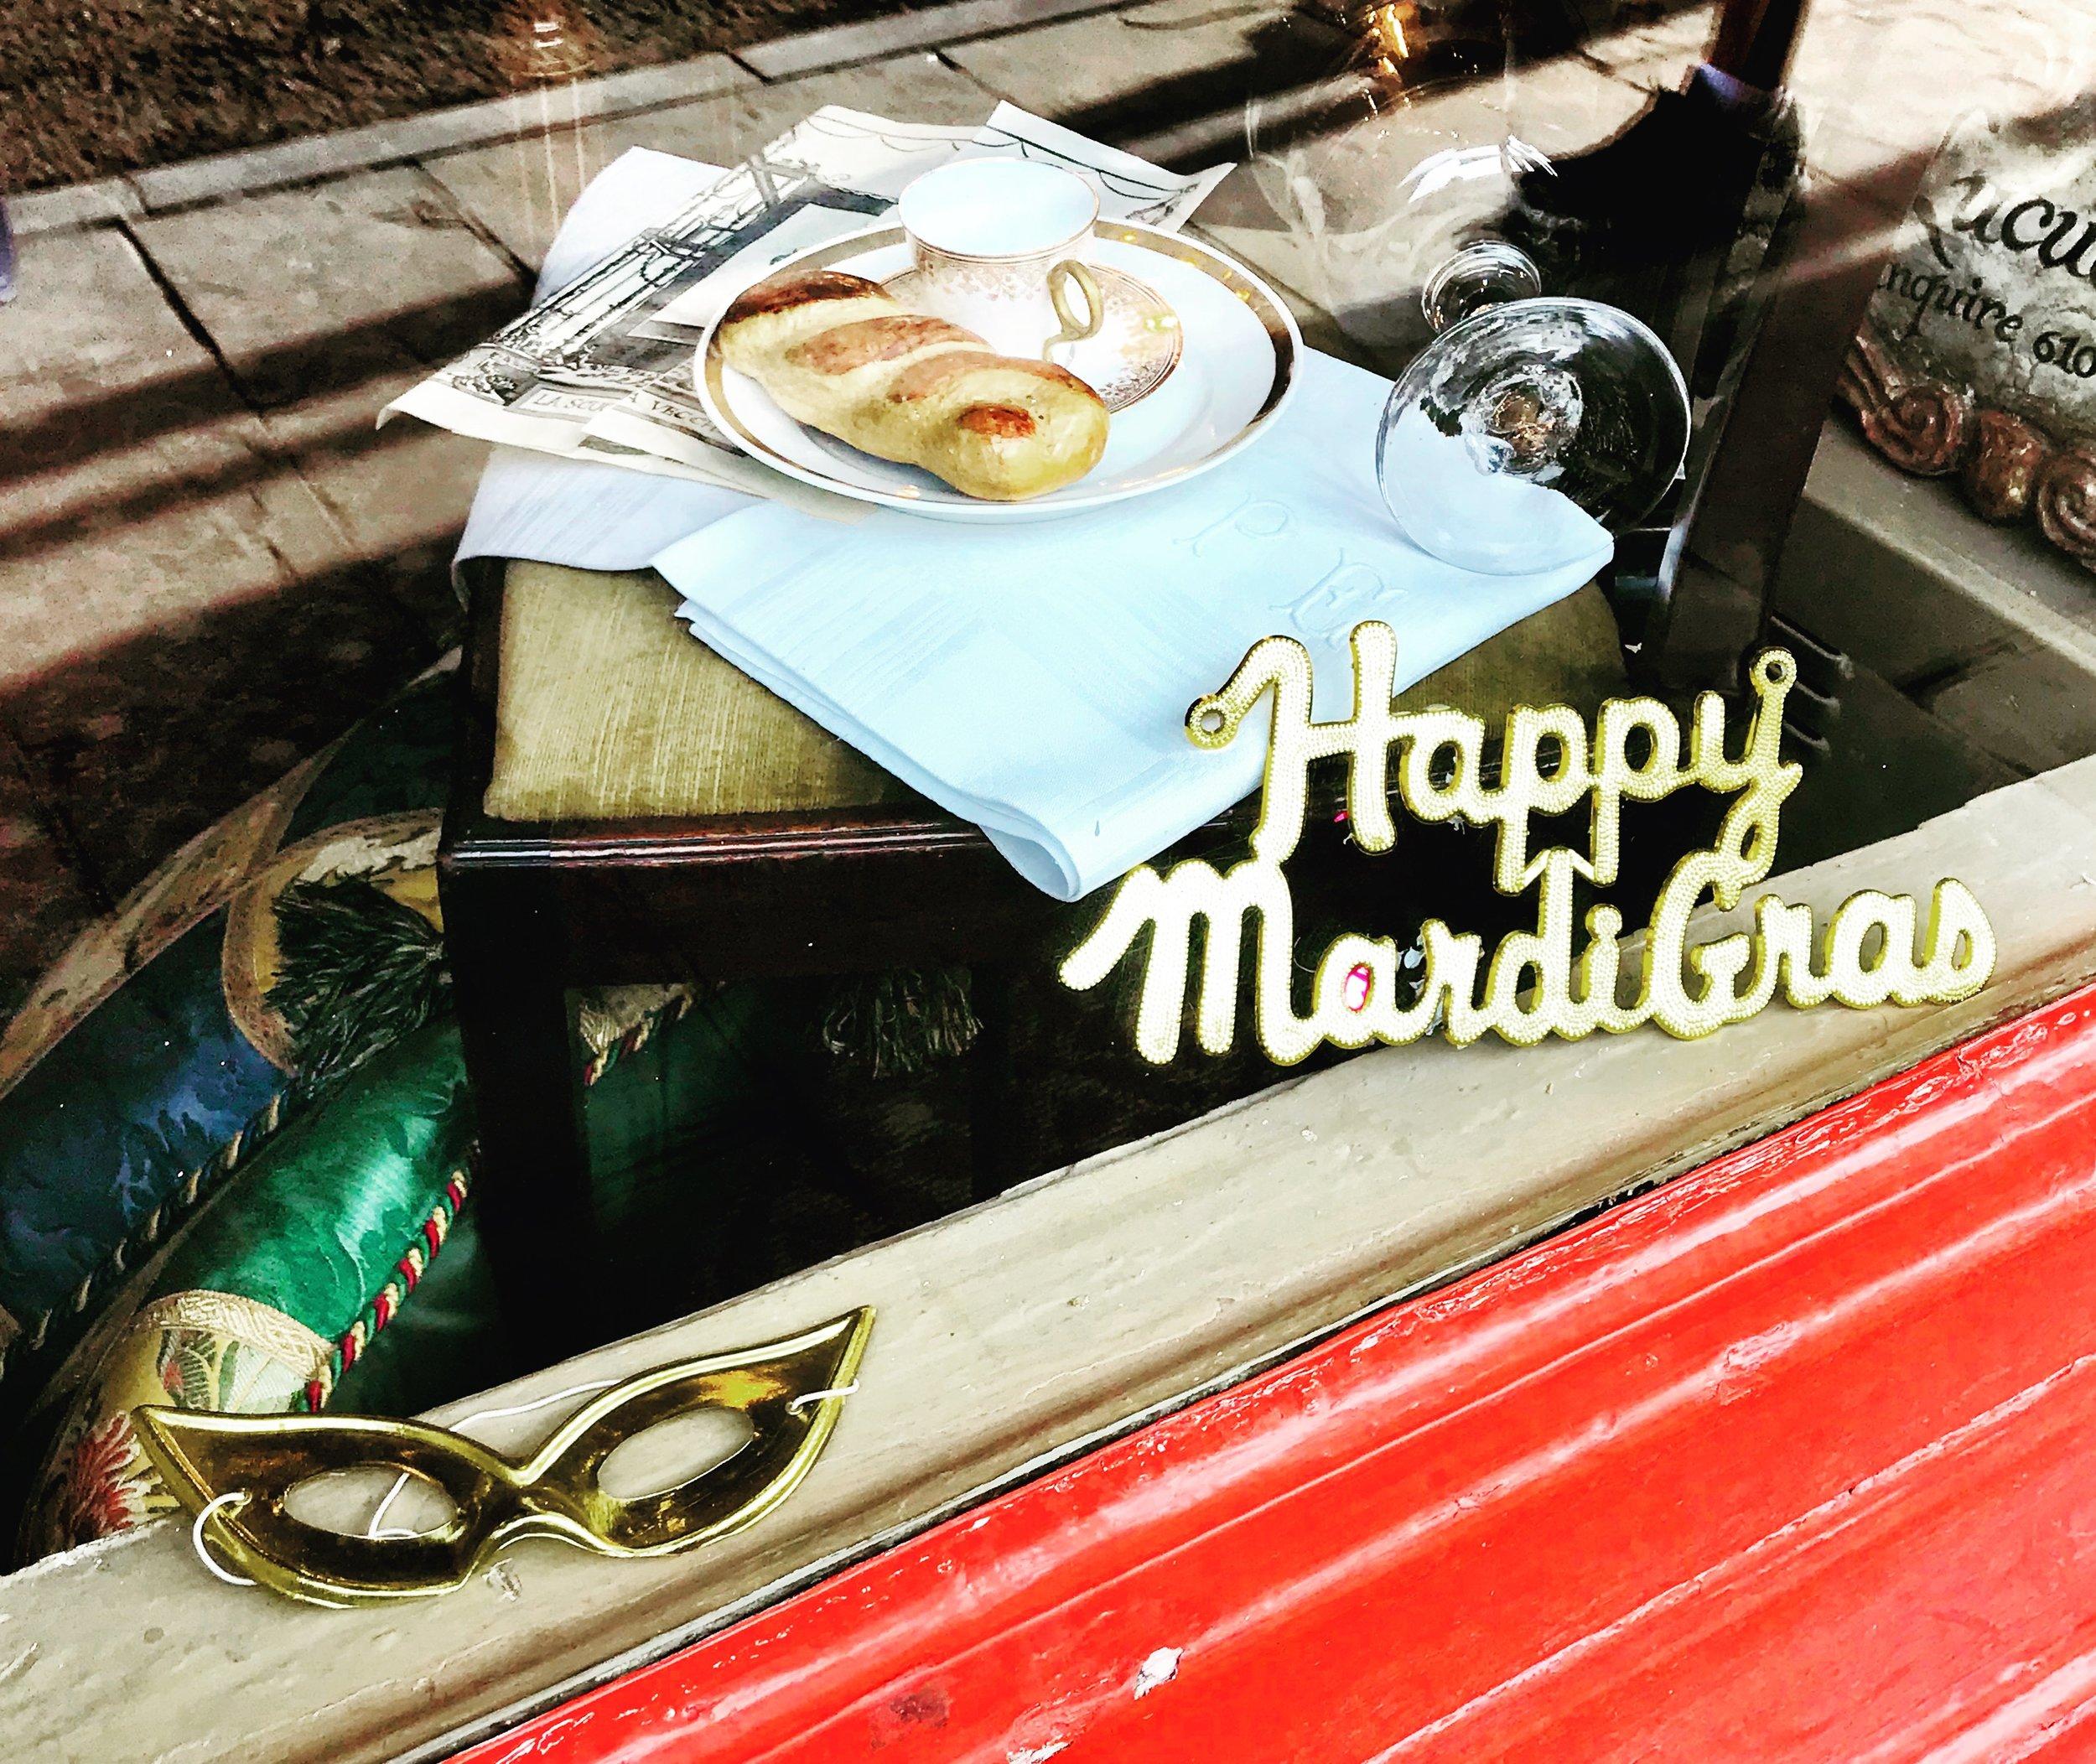 Mardi Gras window.JPG